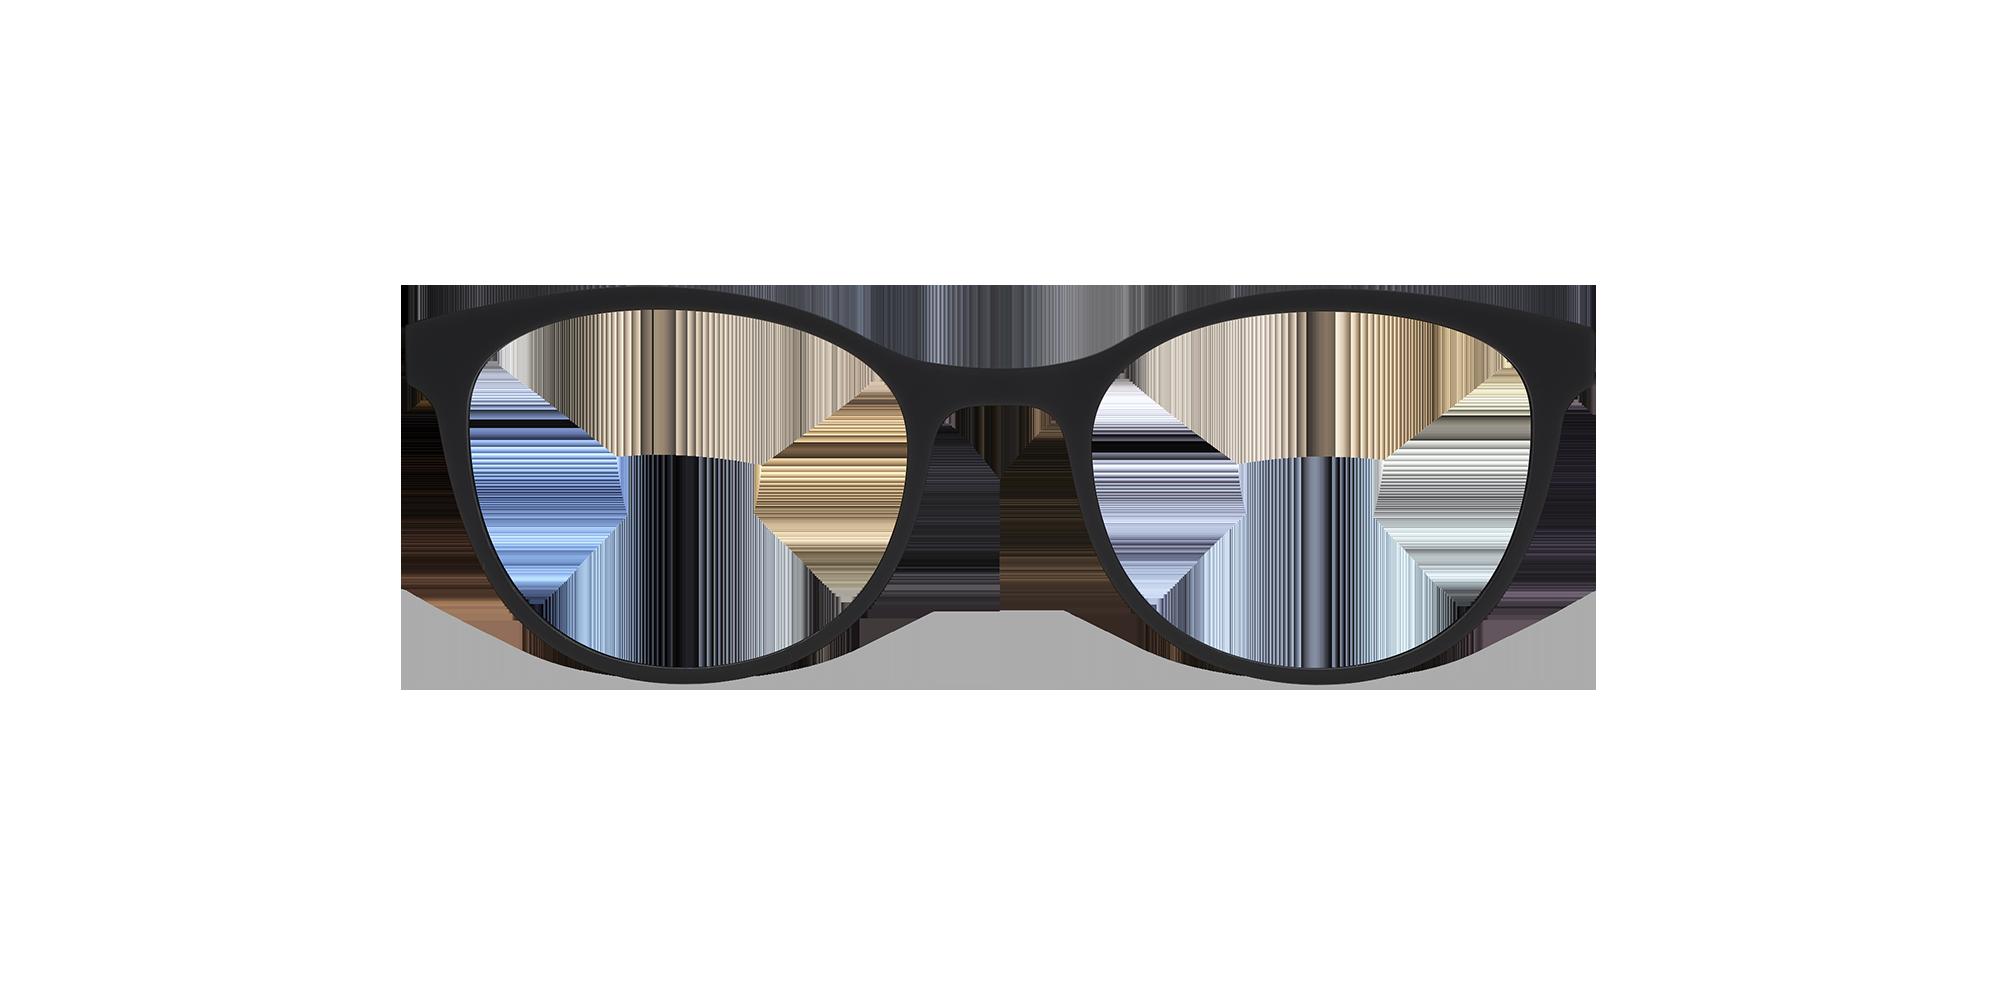 afflelou/france/products/smart_clip/clips_glasses/TMK45BBBK014818.png